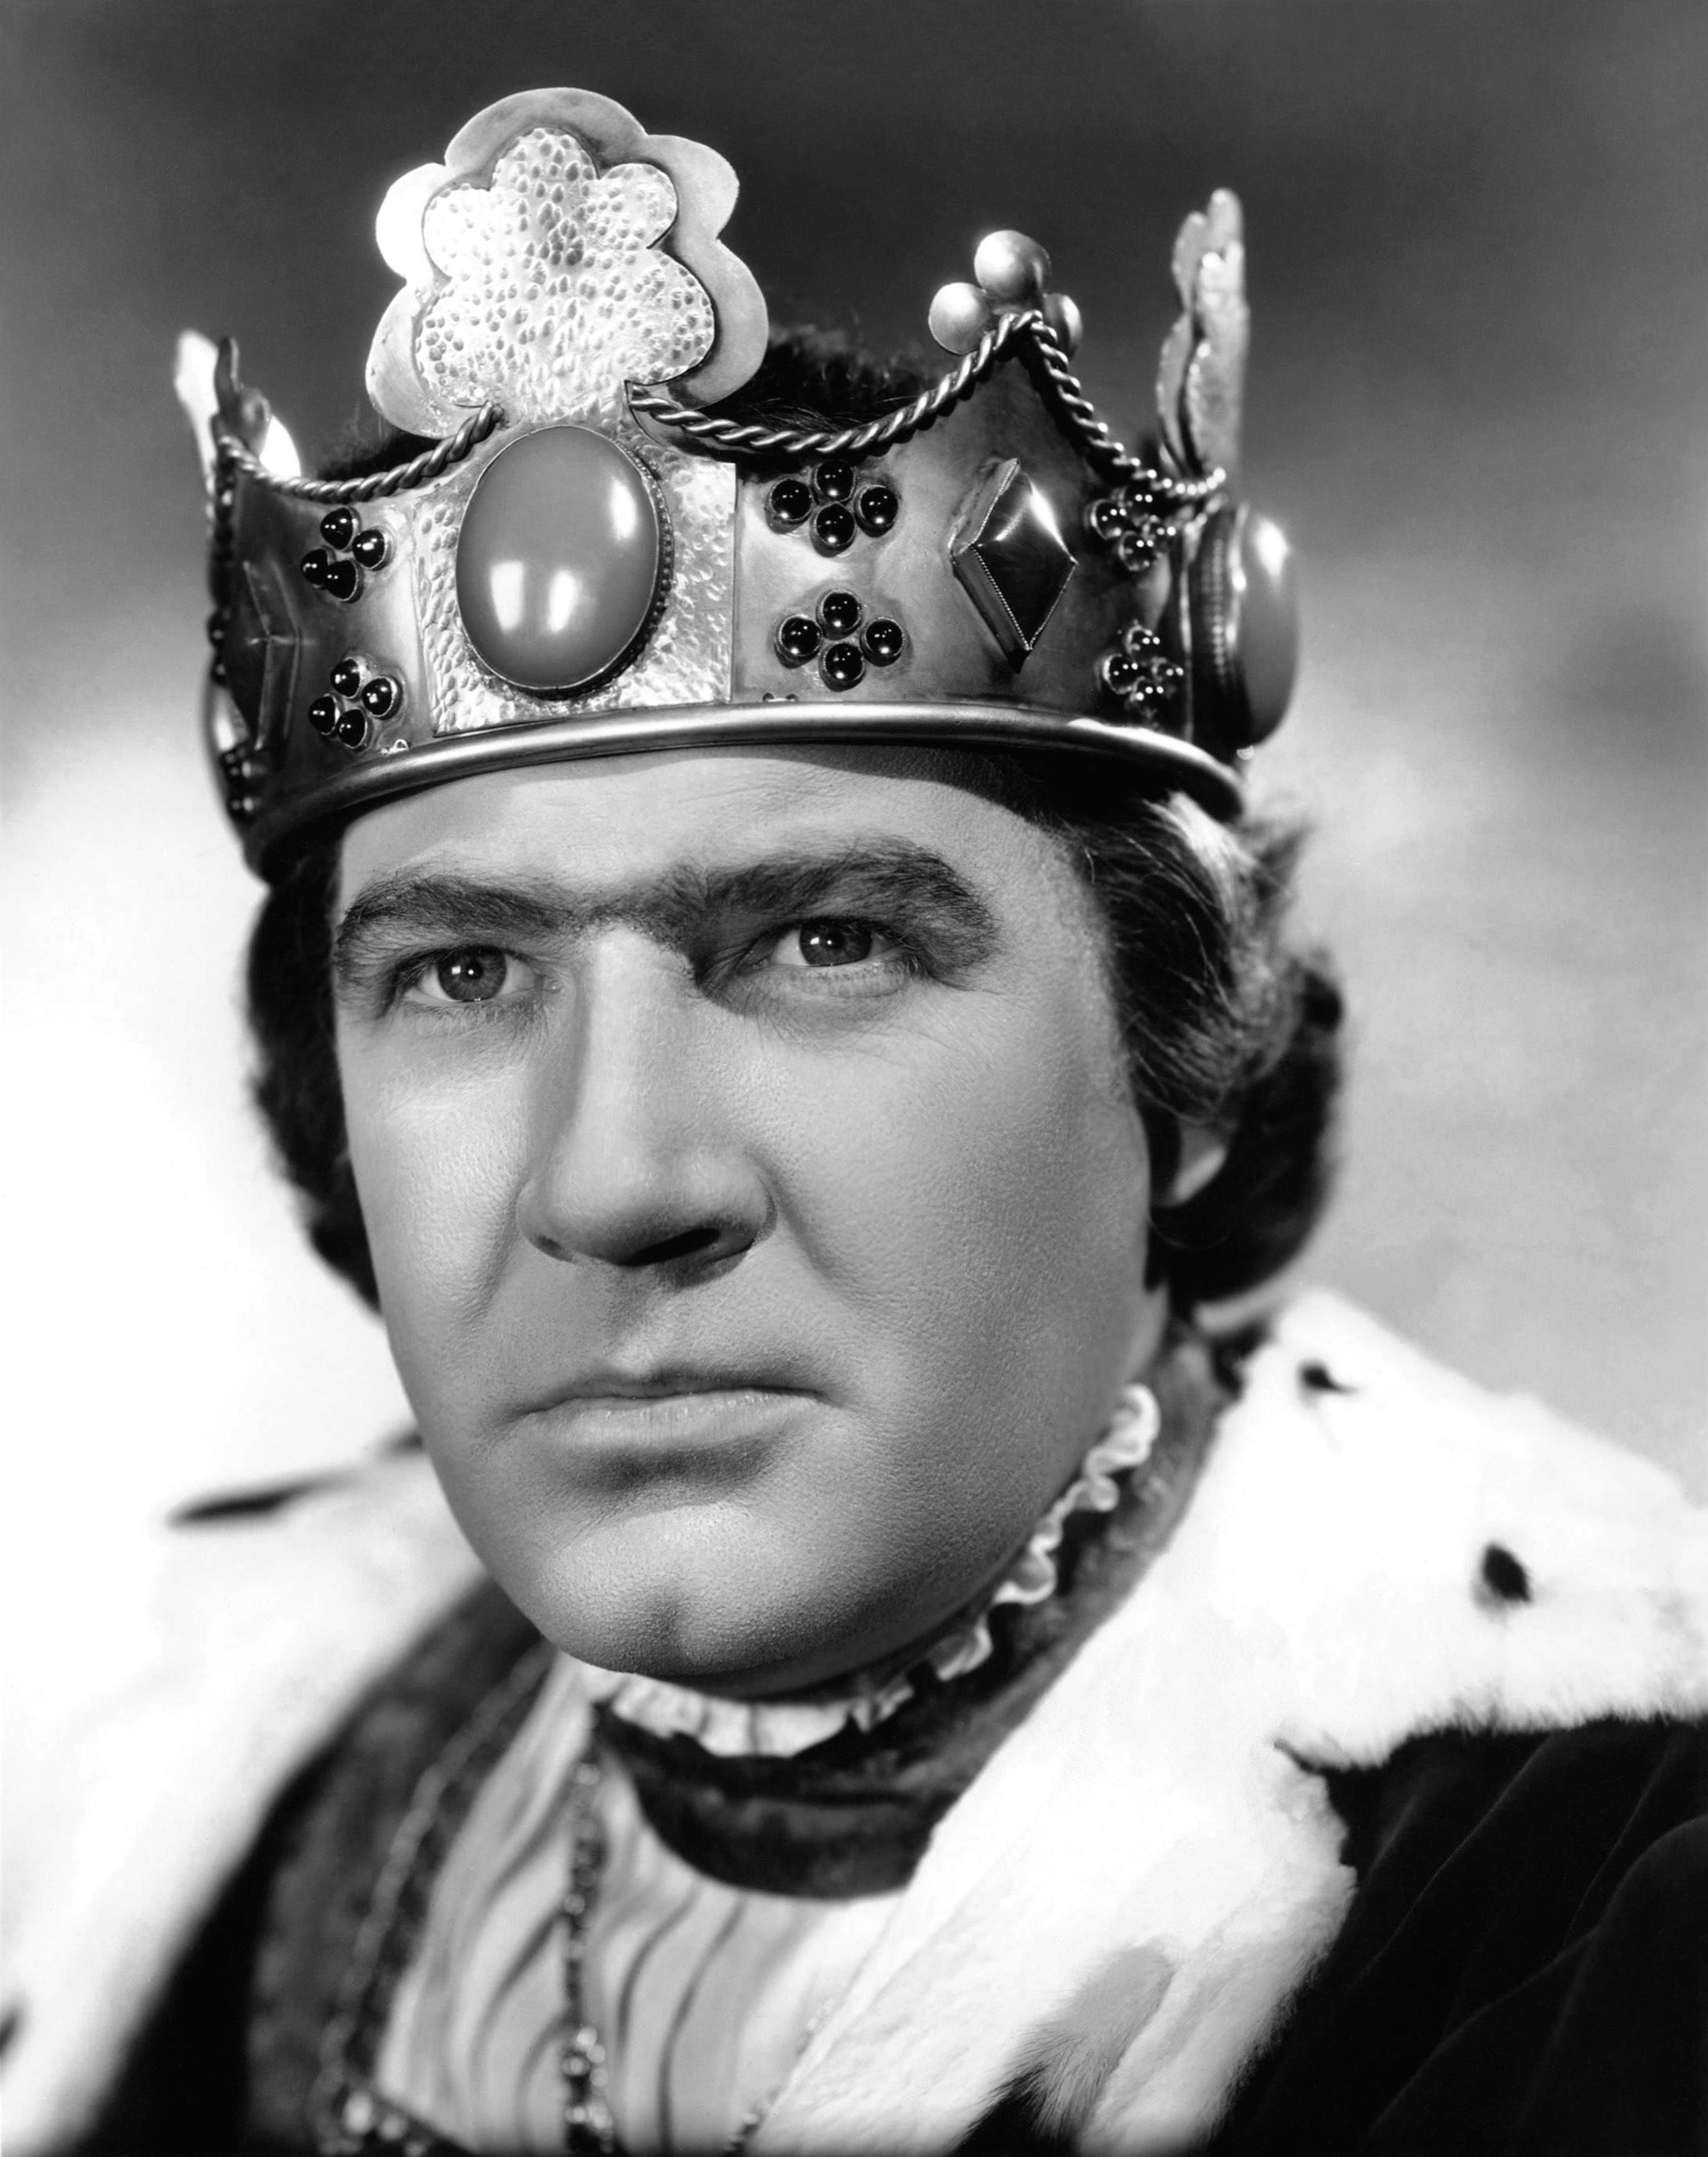 Ian Hunter in Tower of London